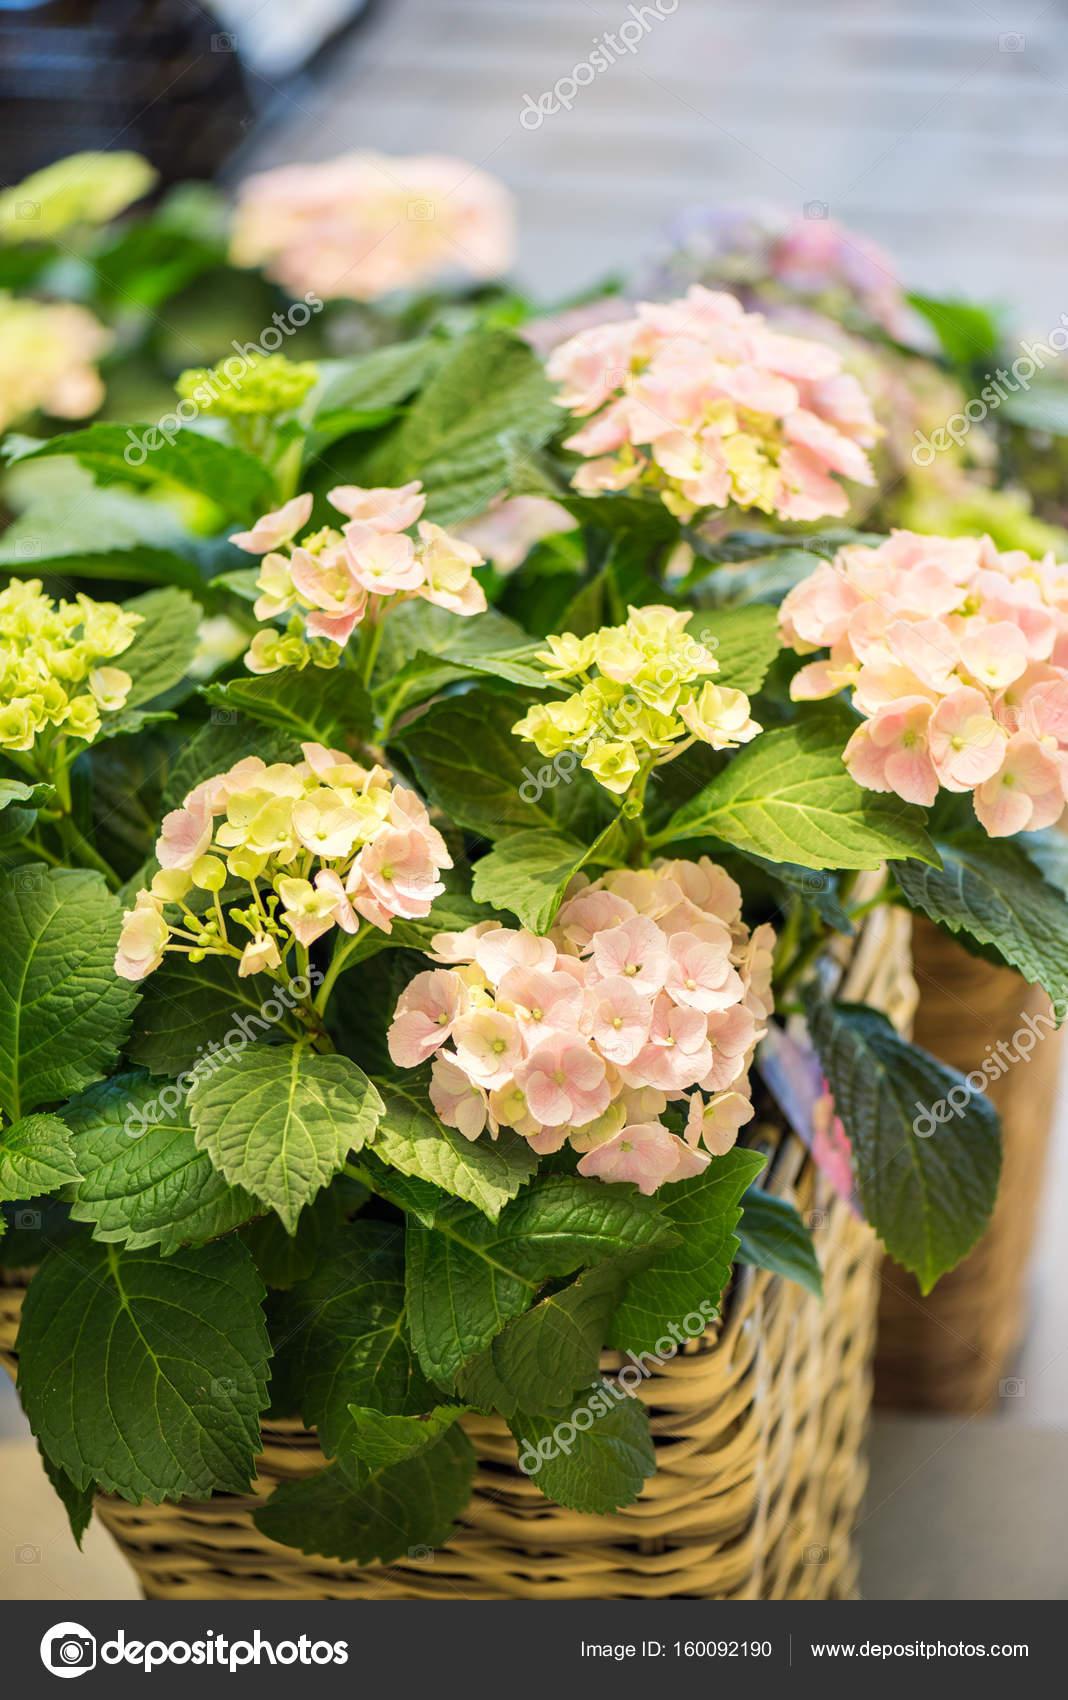 Beautiful flowers in flower shop stock photo arturverkhovetskiy beautiful flowers in flower shop stock photo izmirmasajfo Gallery